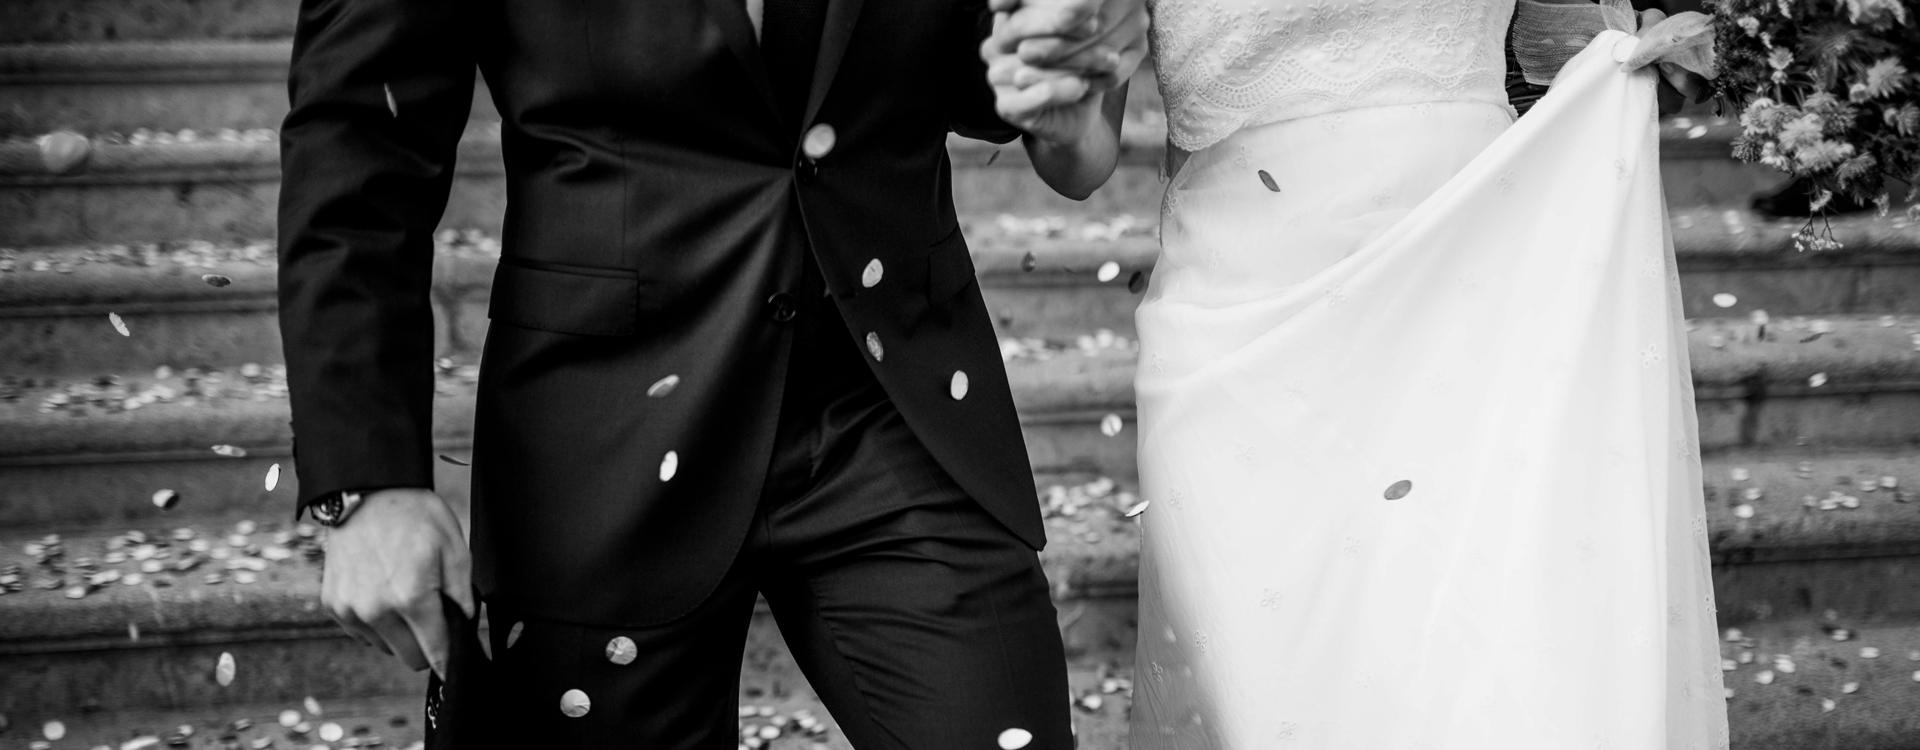 olatz soto fotografia boda